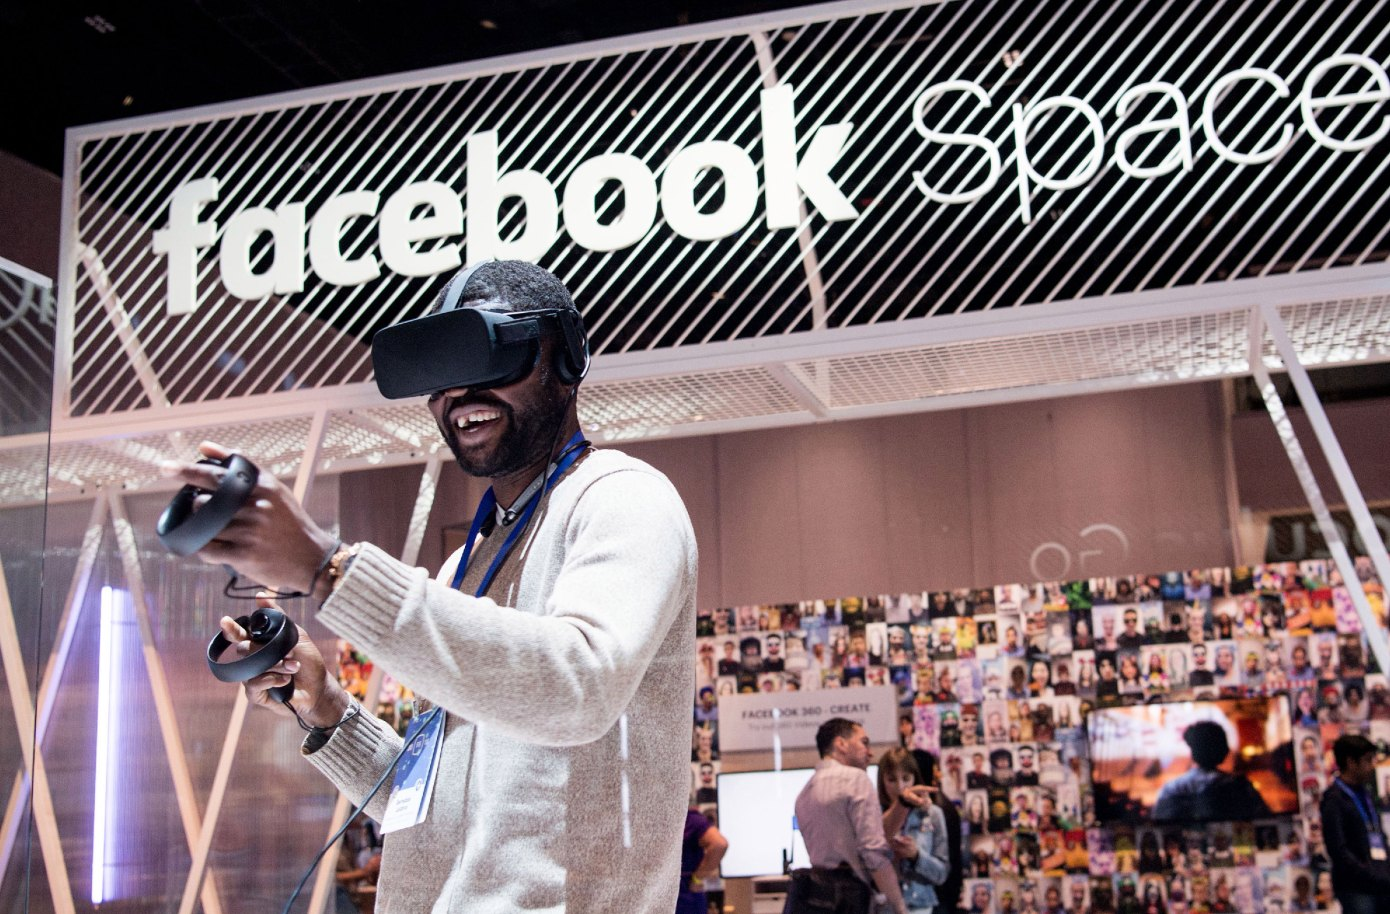 Facebook挖走谷歌的AR/VR工程主管 接管Portal团队